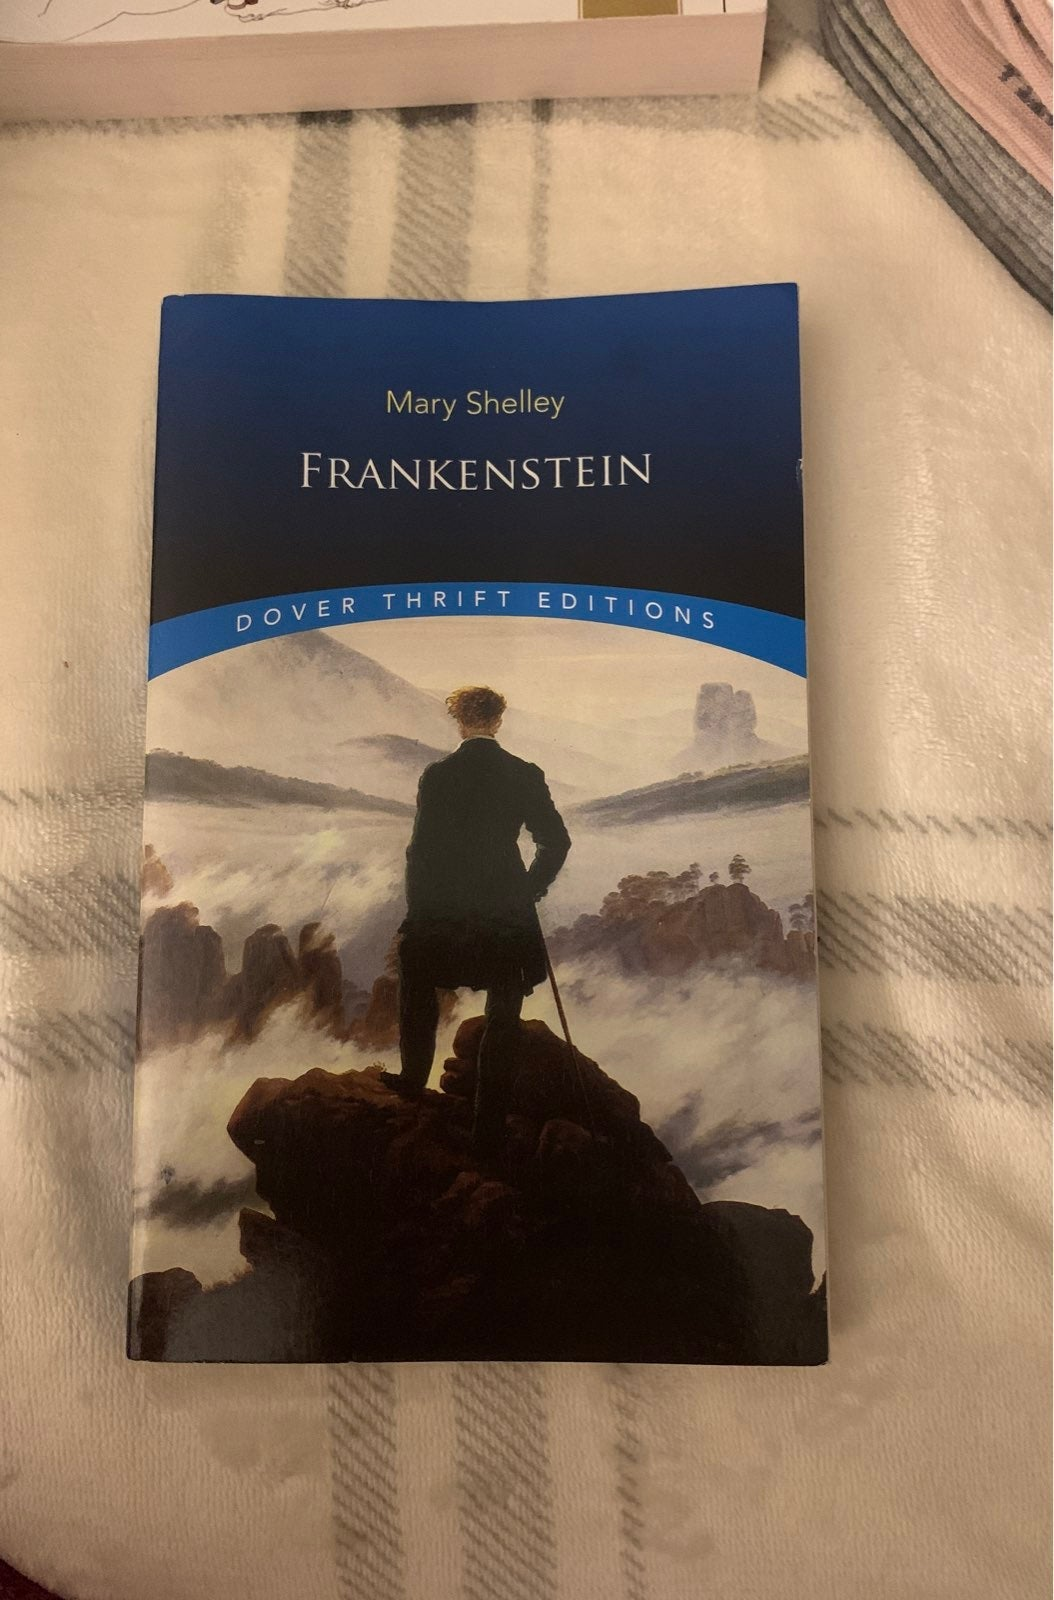 Frankenstein Mary Shelley book